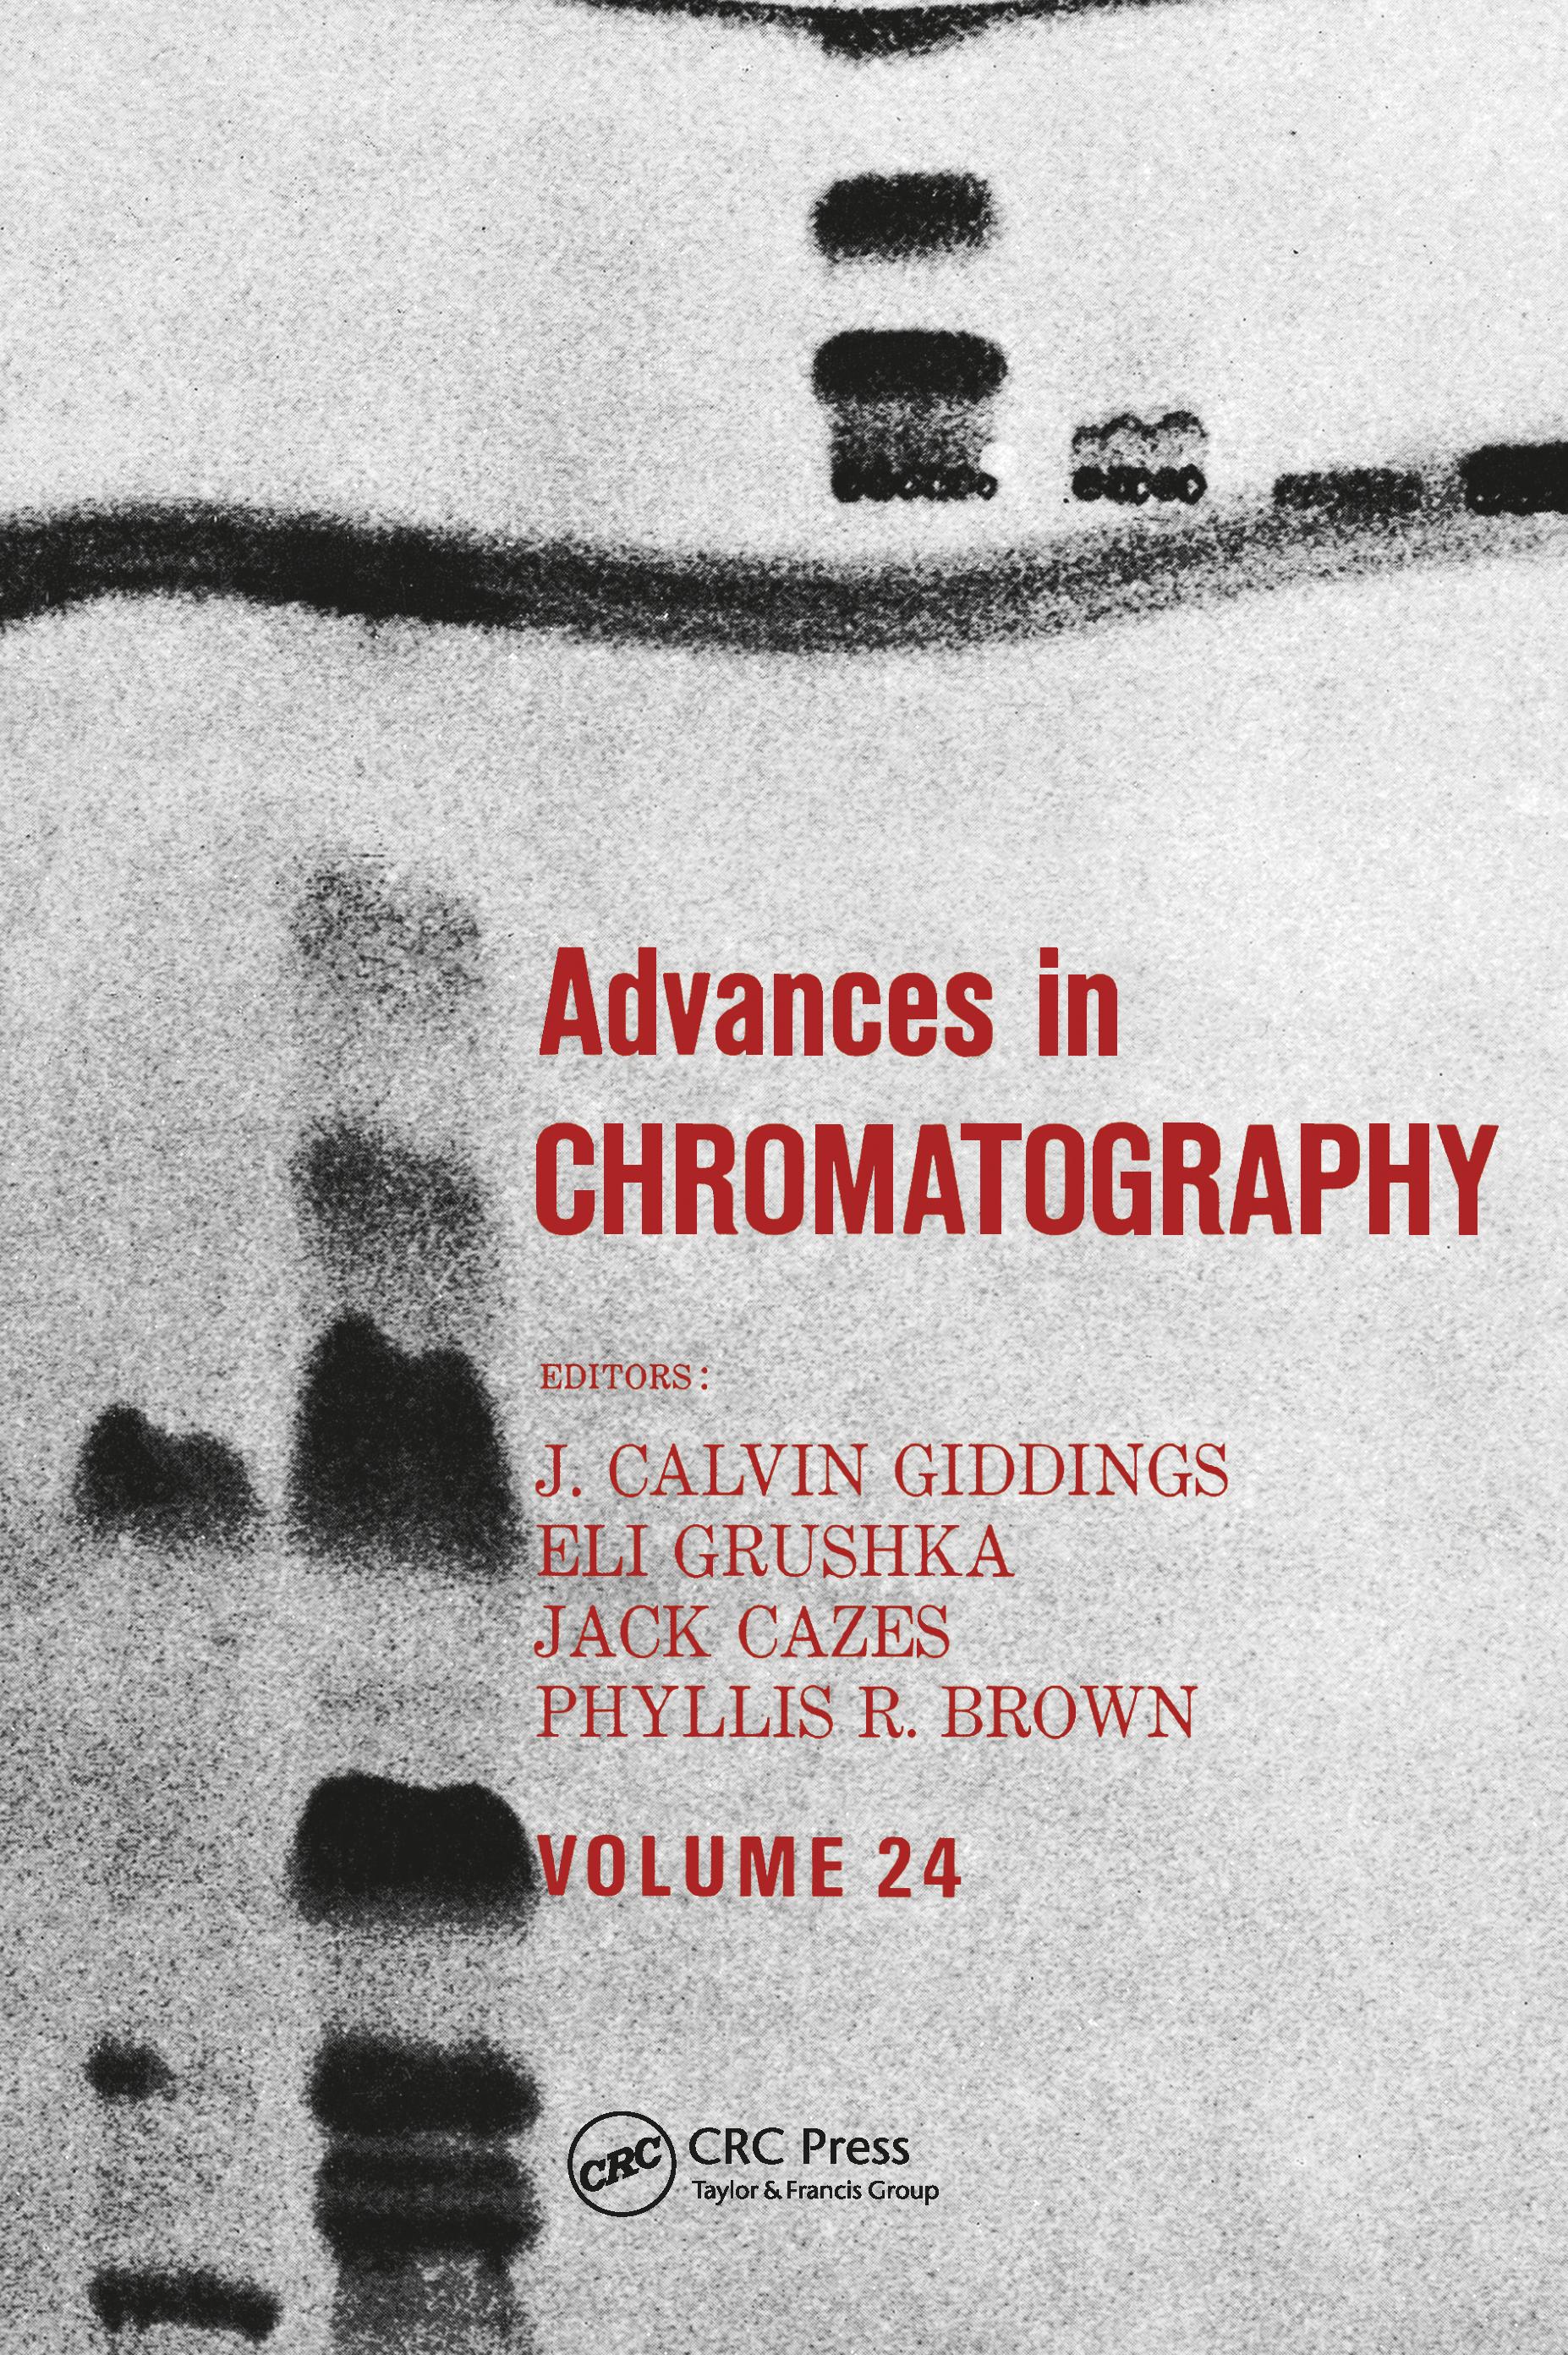 Advances in Chromatography: Volume 24 book cover